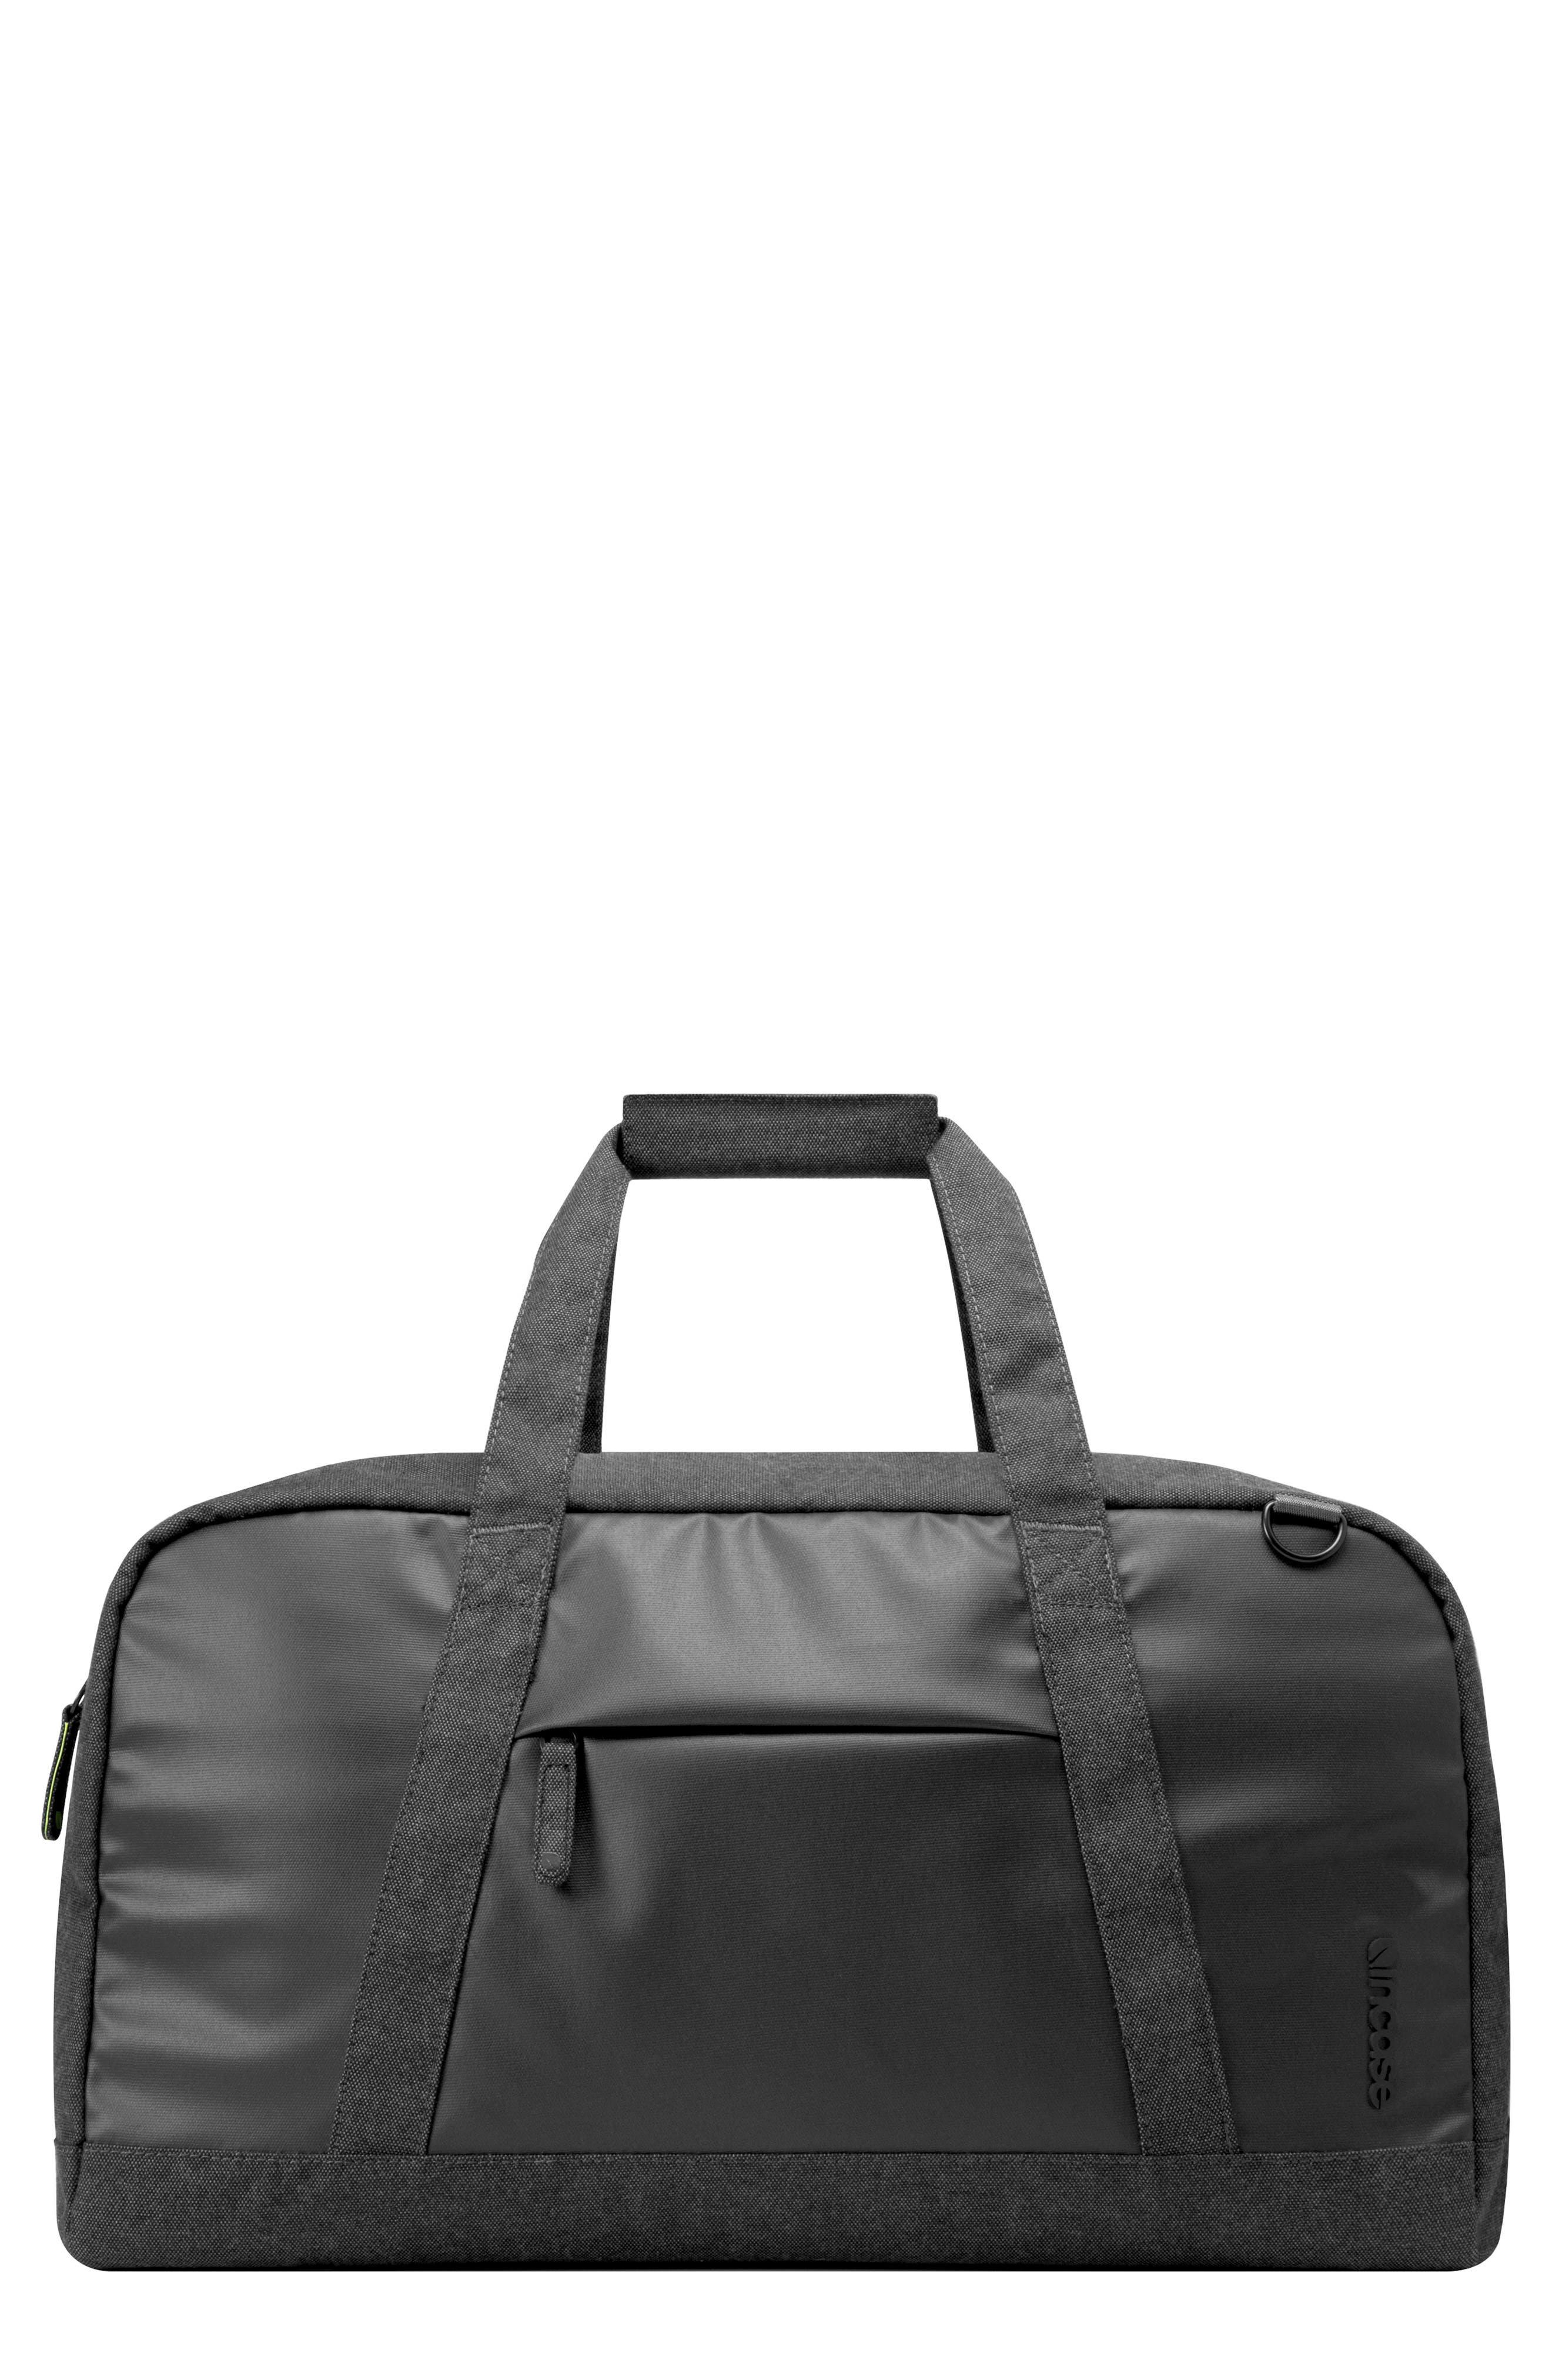 INCASE DESIGNS EO Duffel Bag, Main, color, BLACK